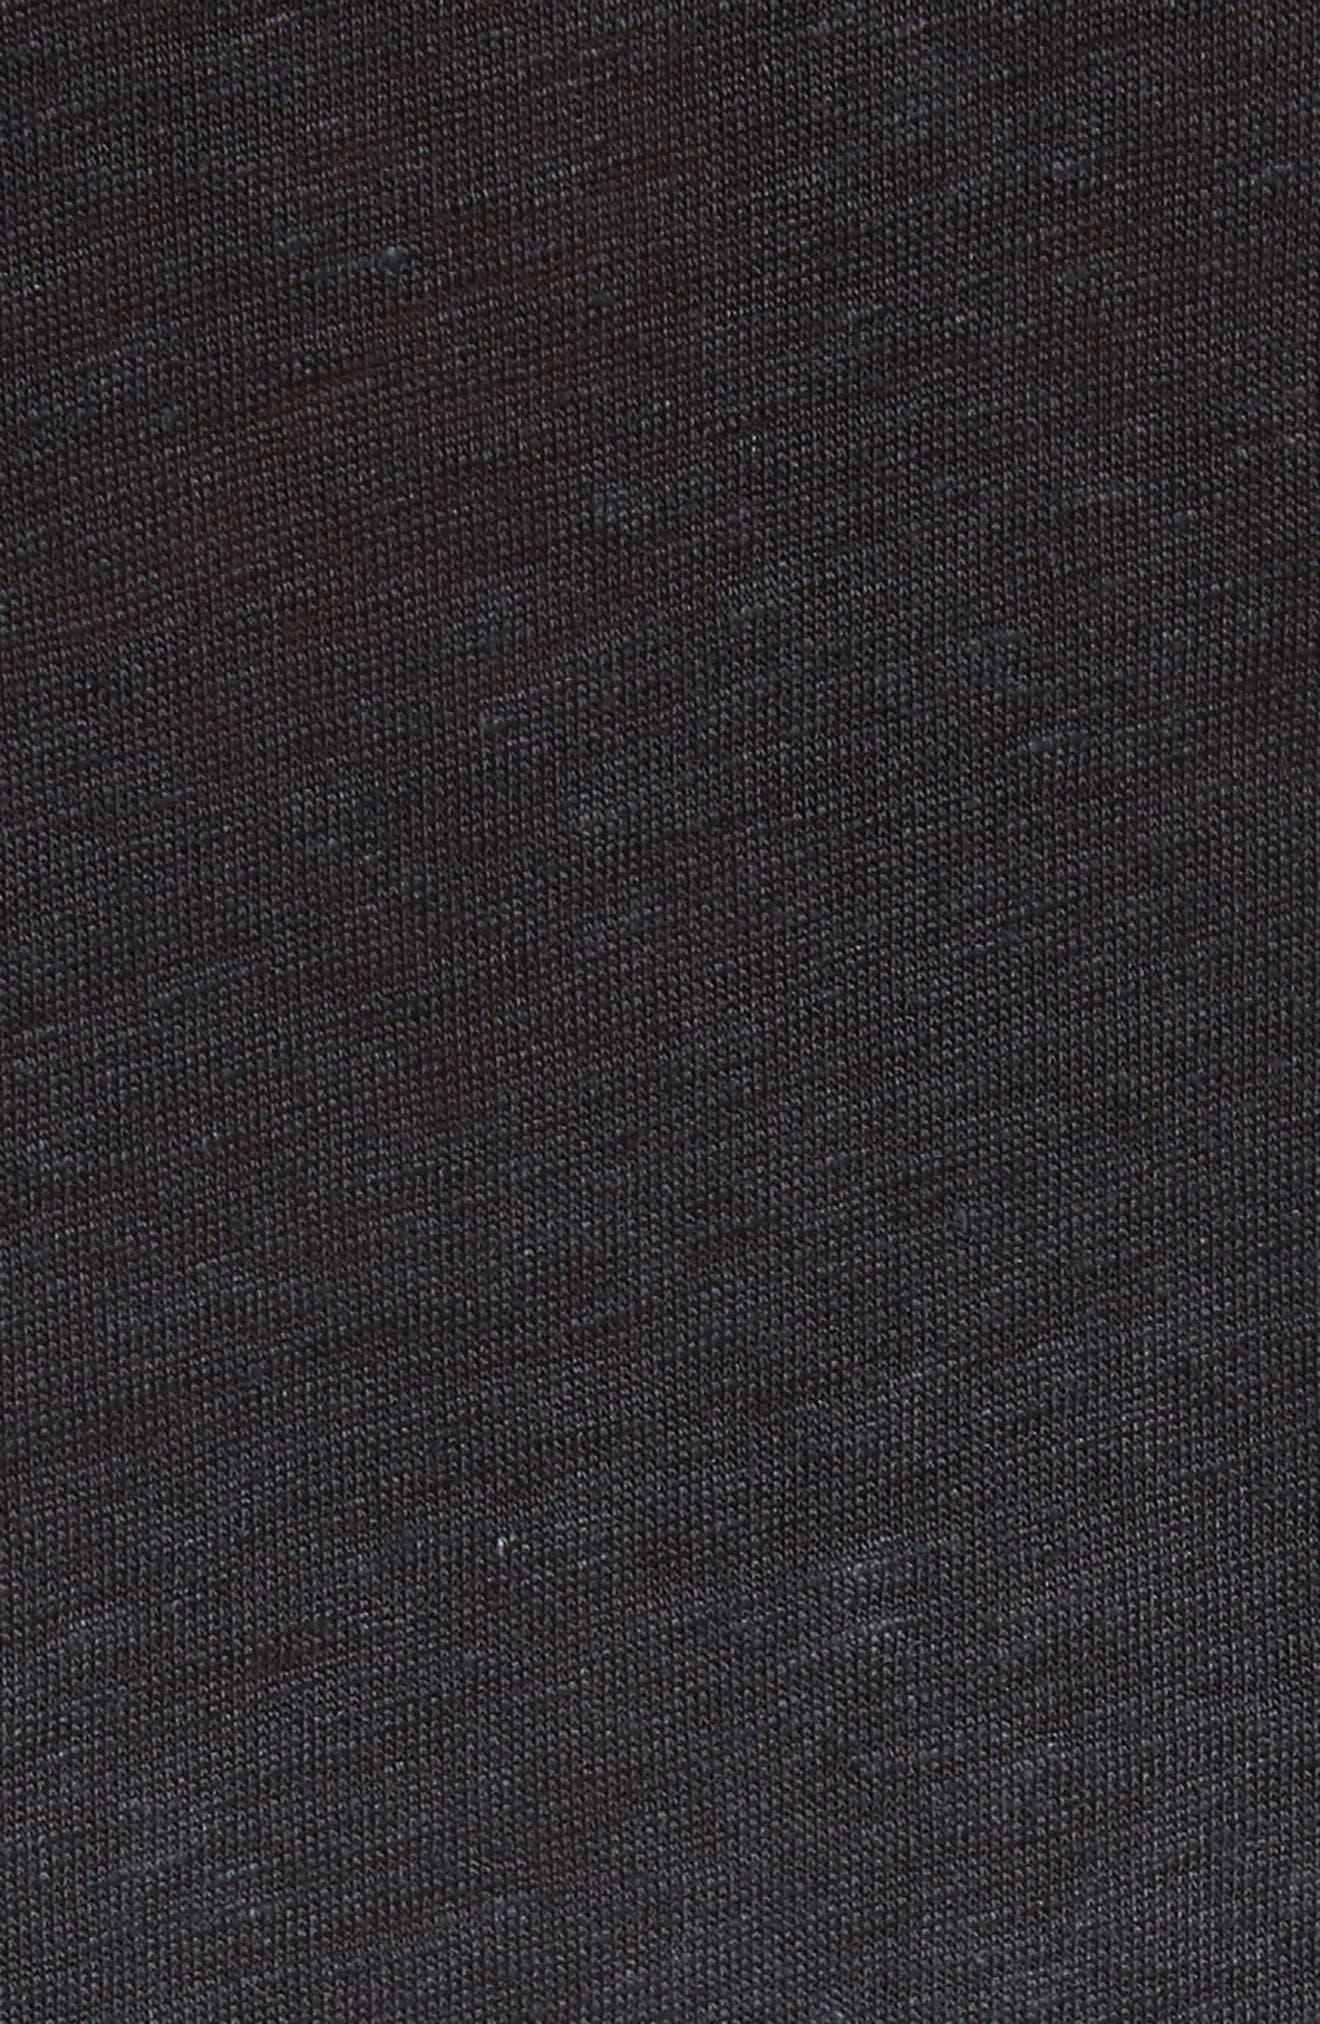 Dip Dyed Linen T-Shirt,                             Alternate thumbnail 5, color,                             001